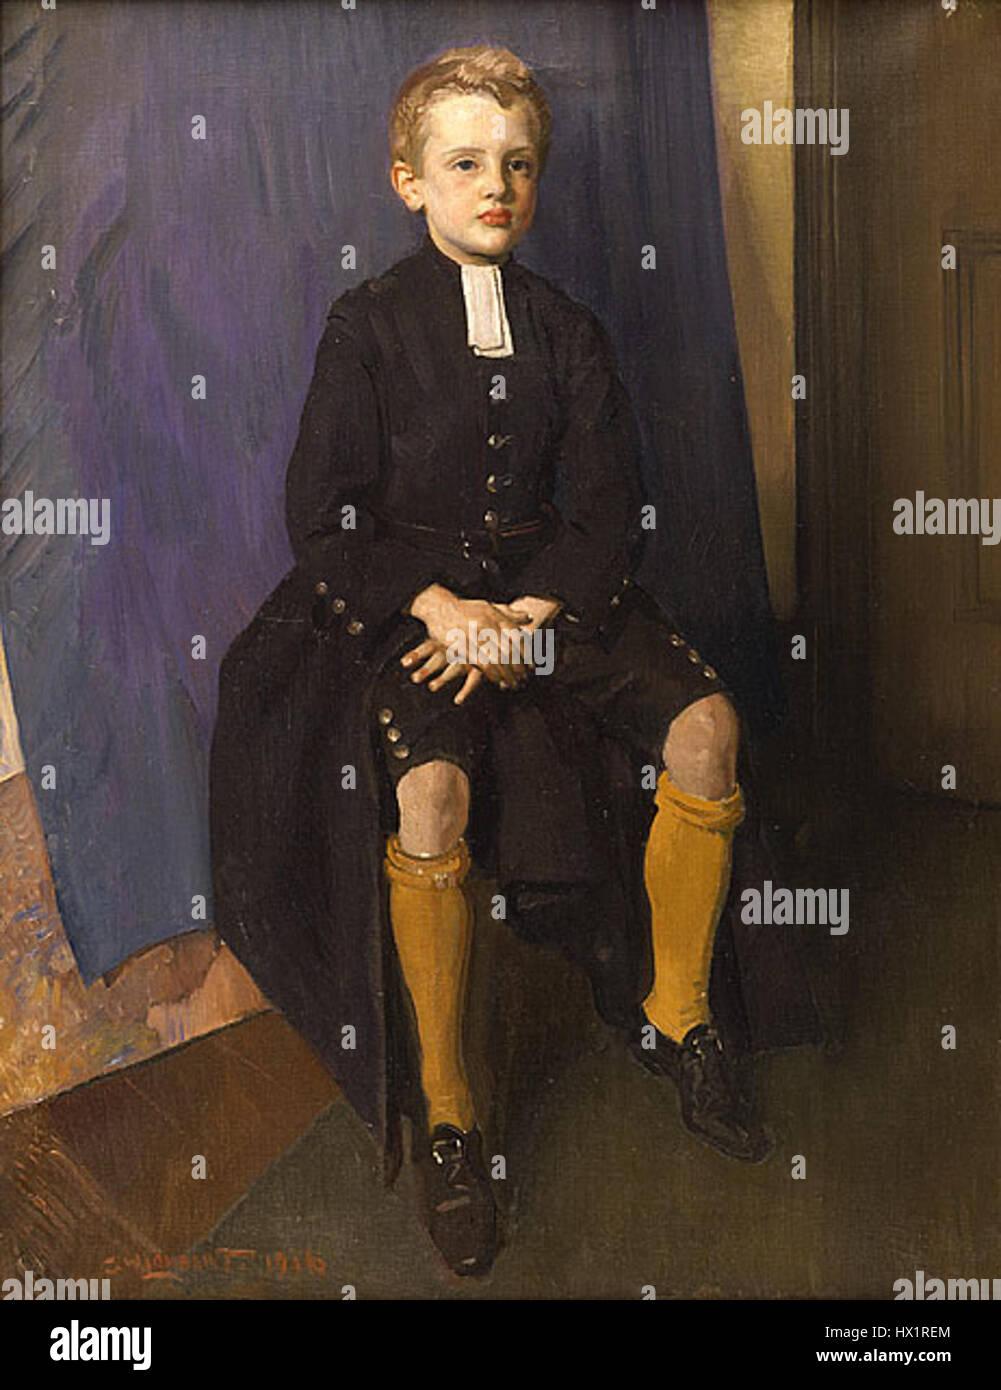 Lambert constante como un muchacho de Blue Coat. Foto de stock